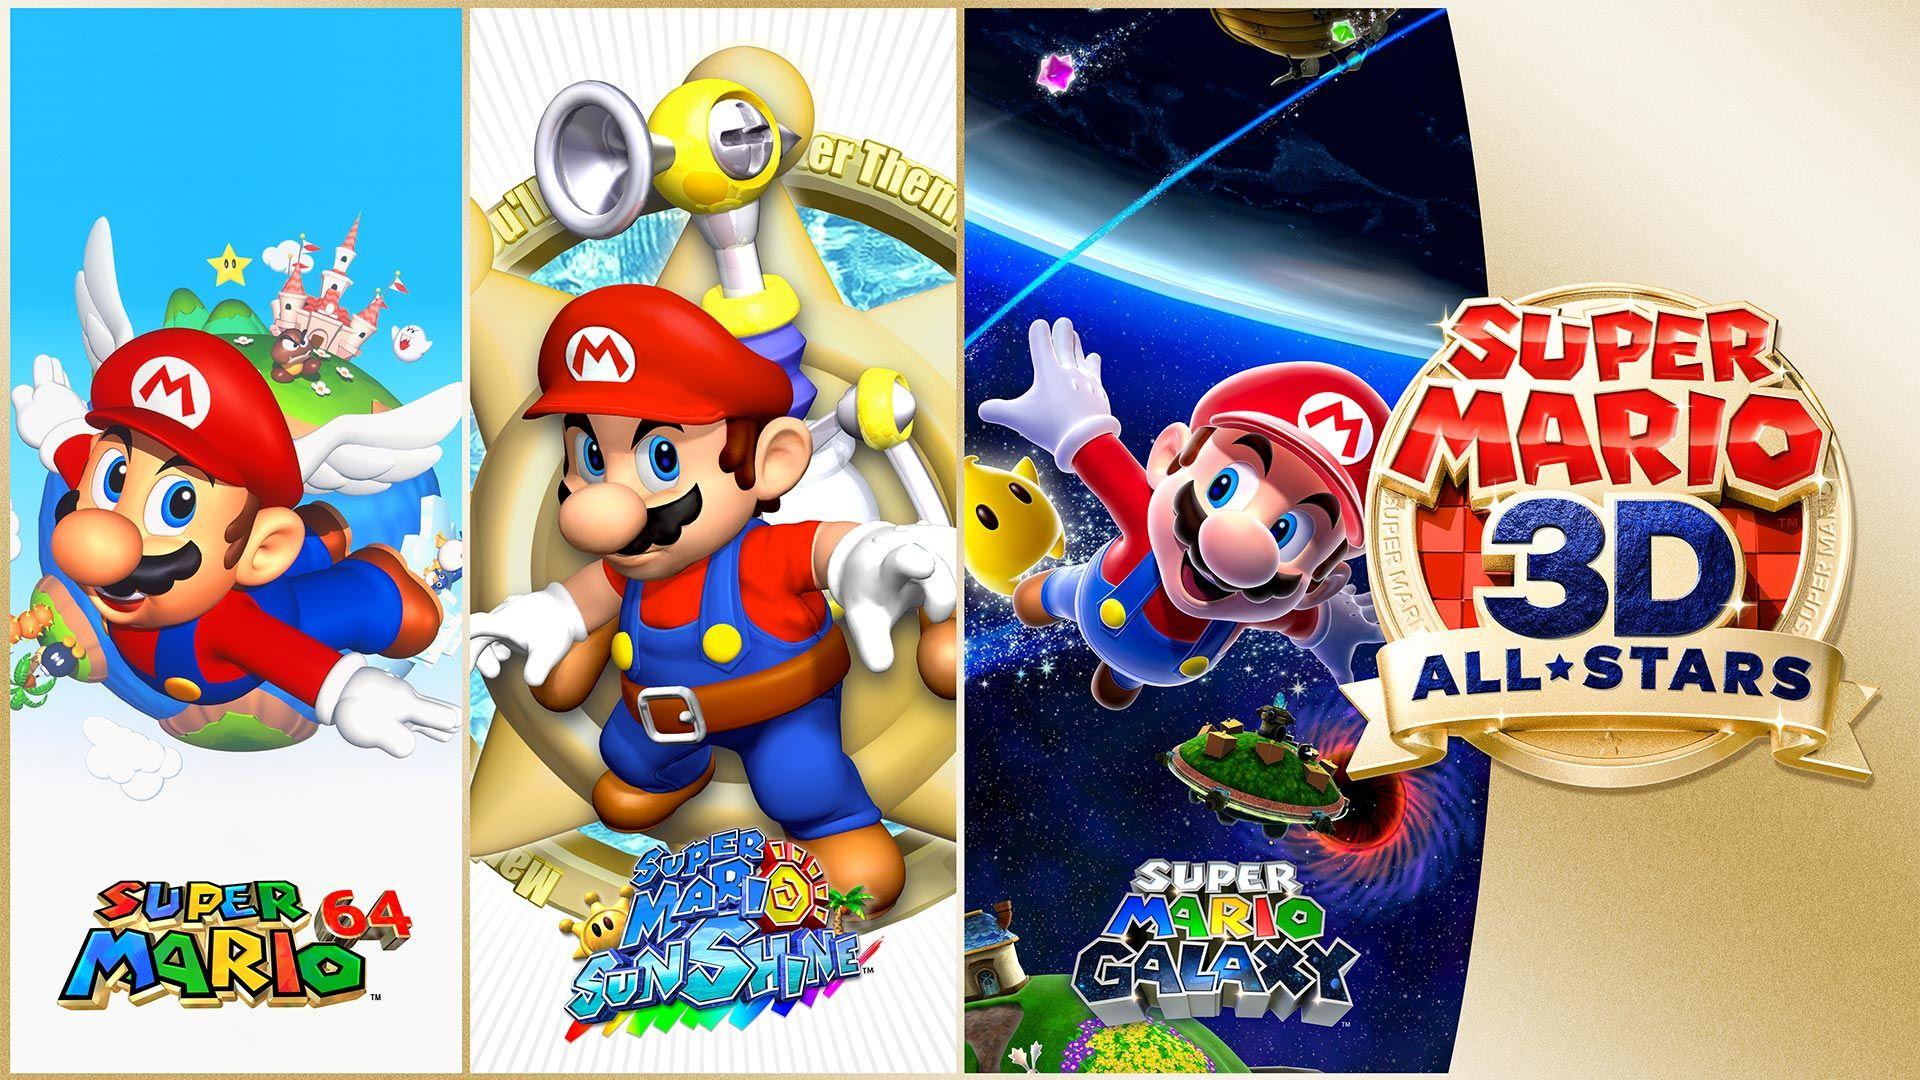 Super Mario 3d All Stars For Nintendo Switch Nintendo Game Mario S Movements Are As Smooth As Ever With Hd R In 2020 Super Mario 3d Super Mario Sunshine Super Mario